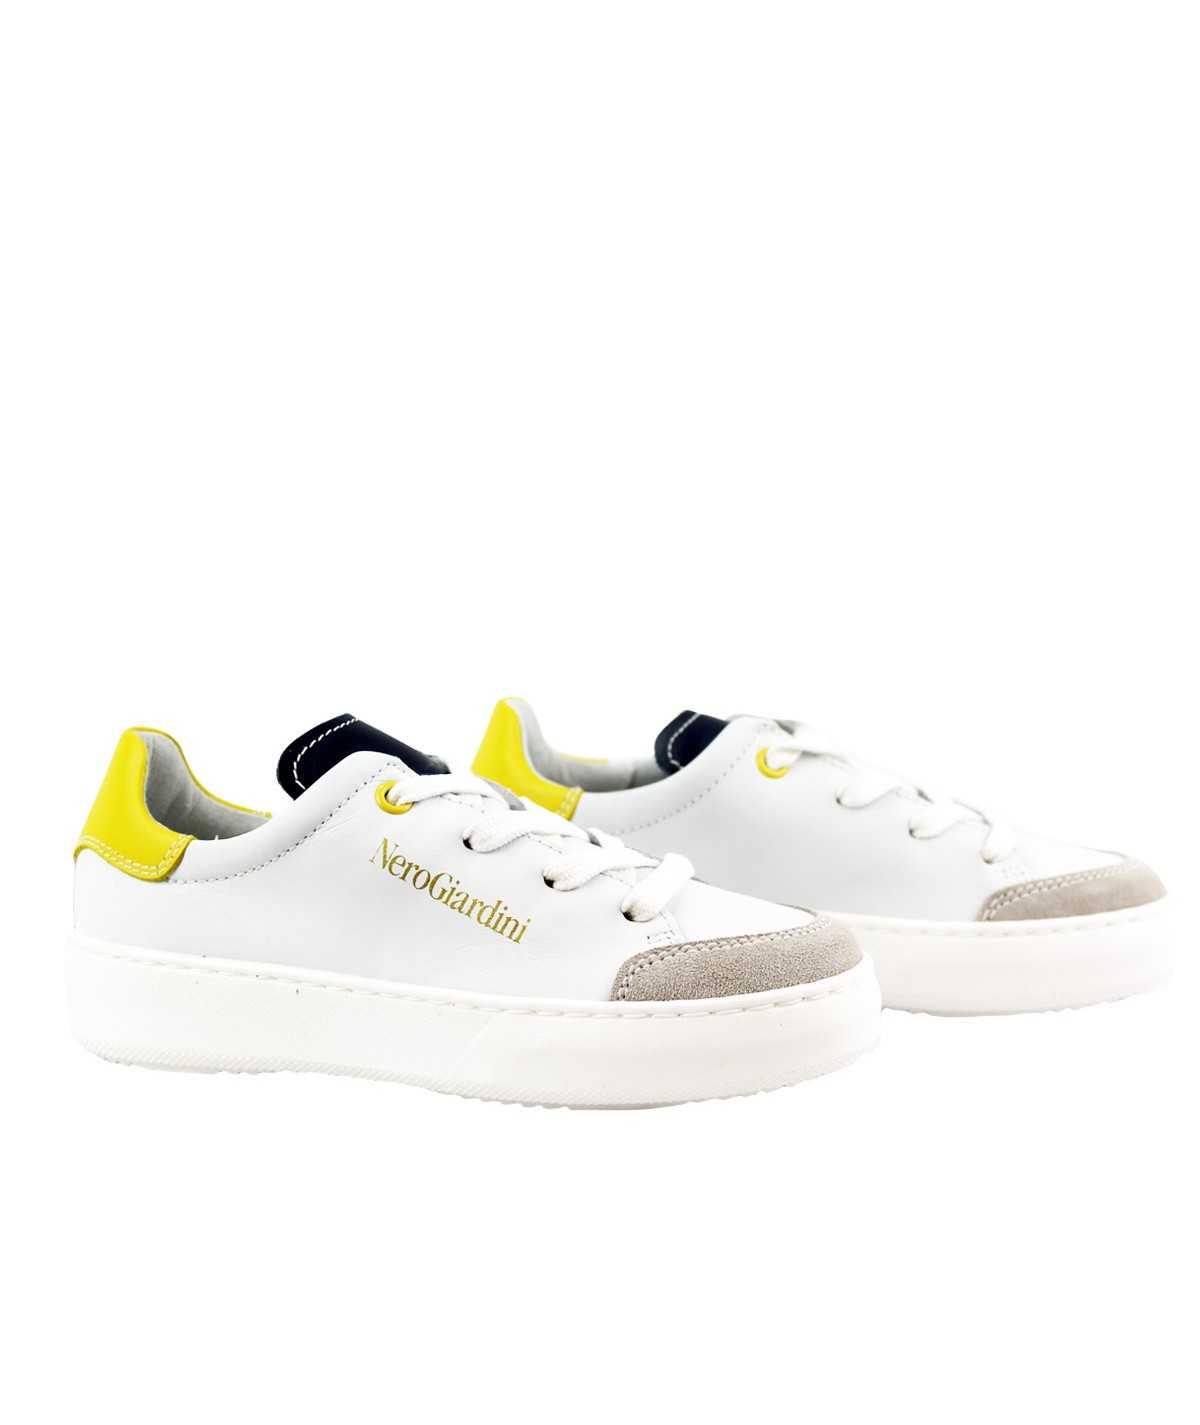 NEROGIARDINI Sneakers...